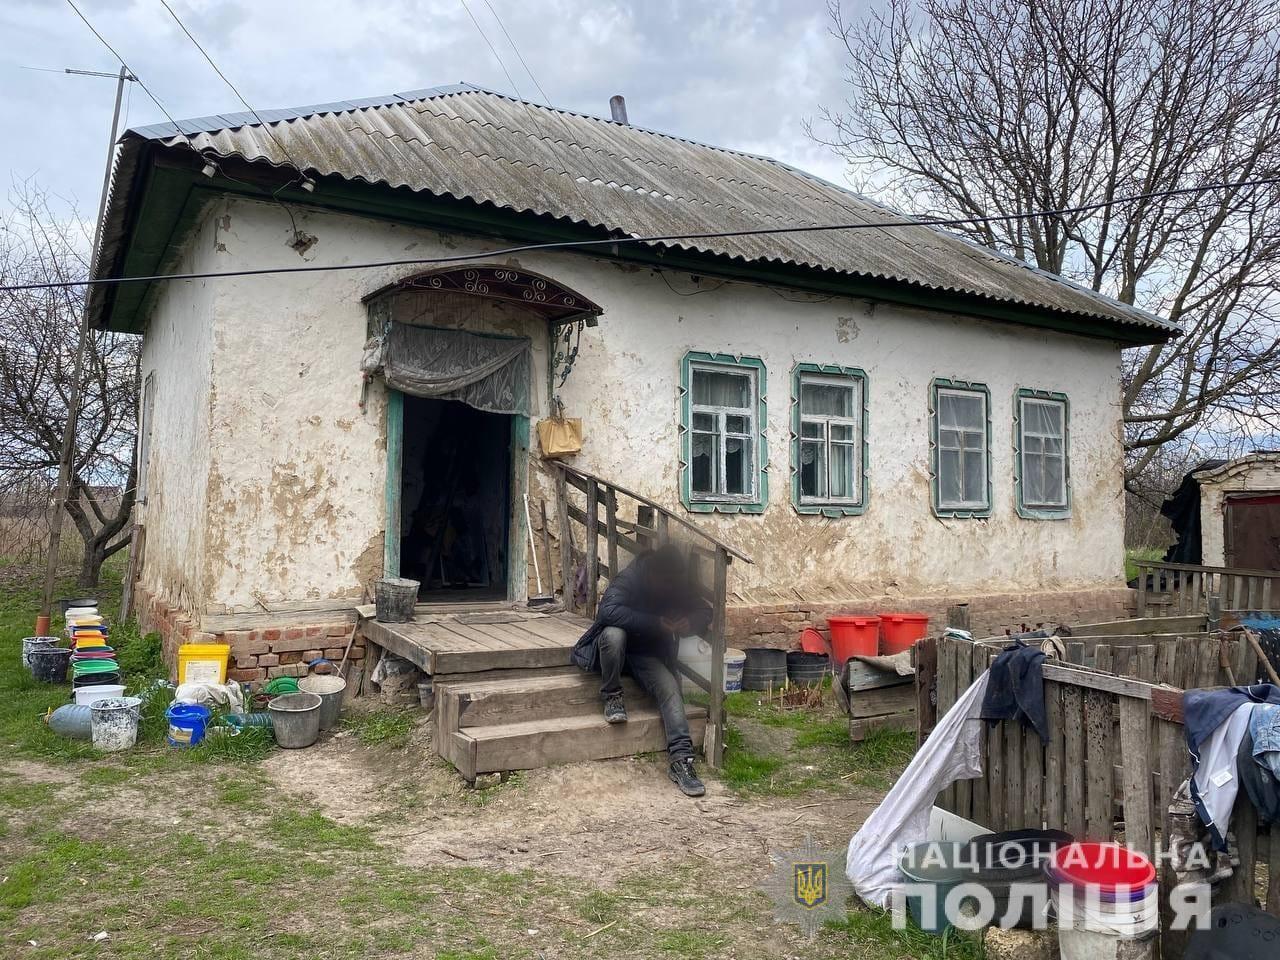 Будинок, де стався злочин